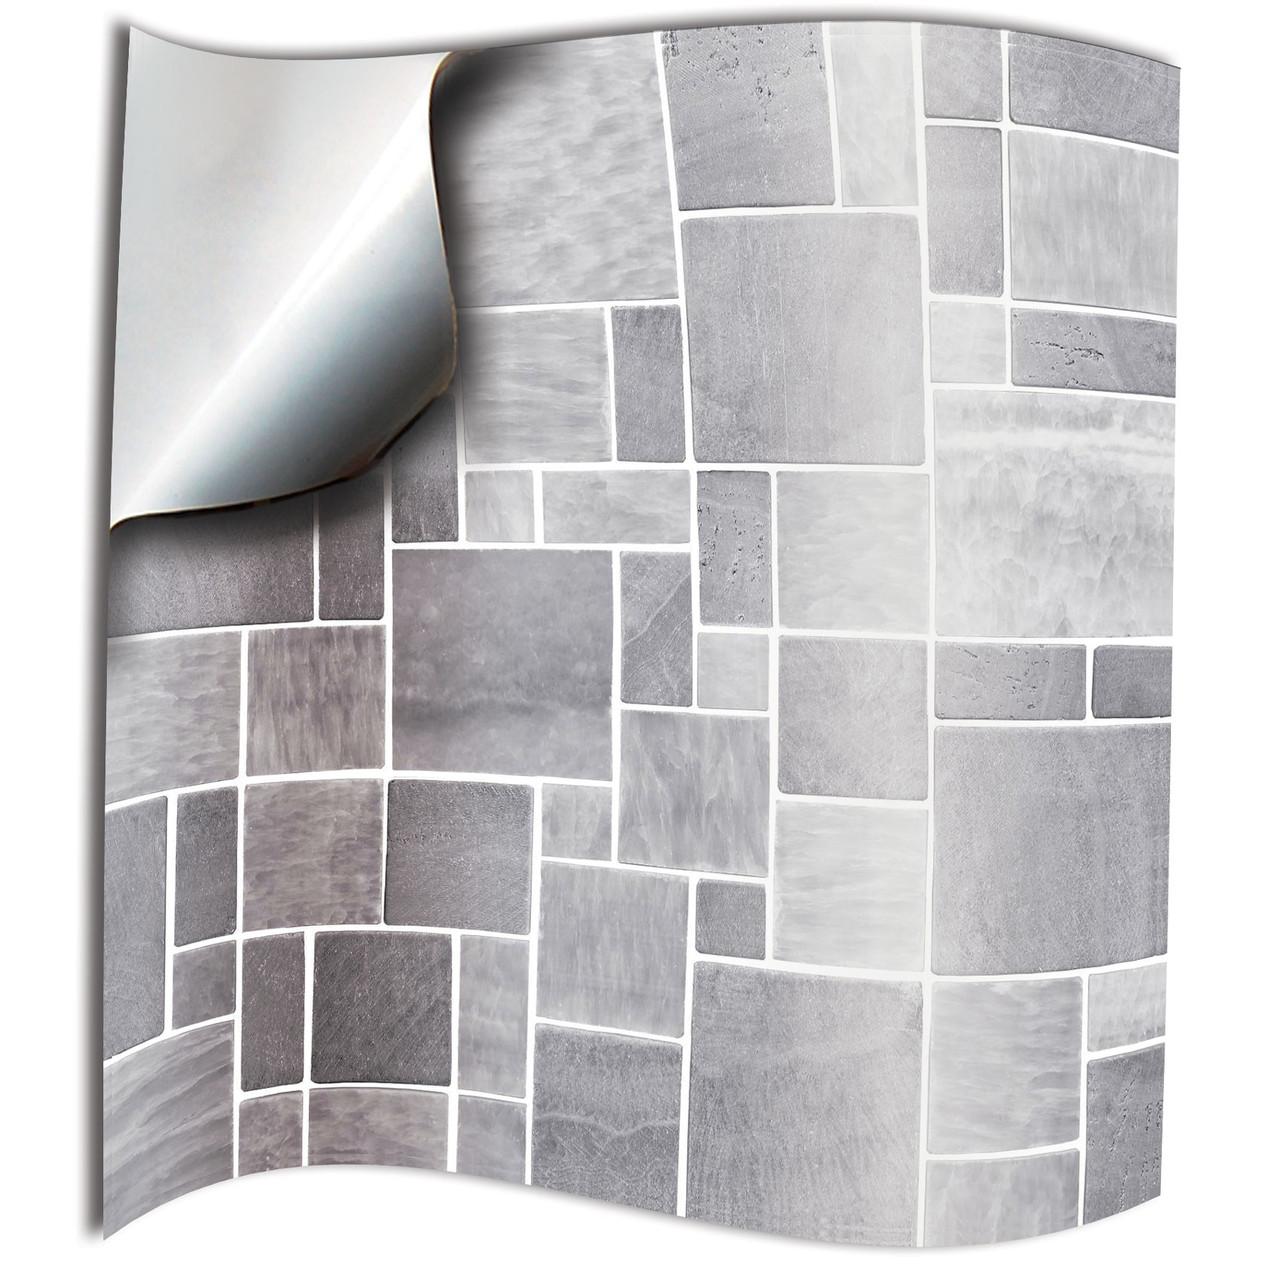 24 bathroom tile stickers kitchen backsplash light grey tile decals 15x15 10x10cm tile transfers 6x6 4x4